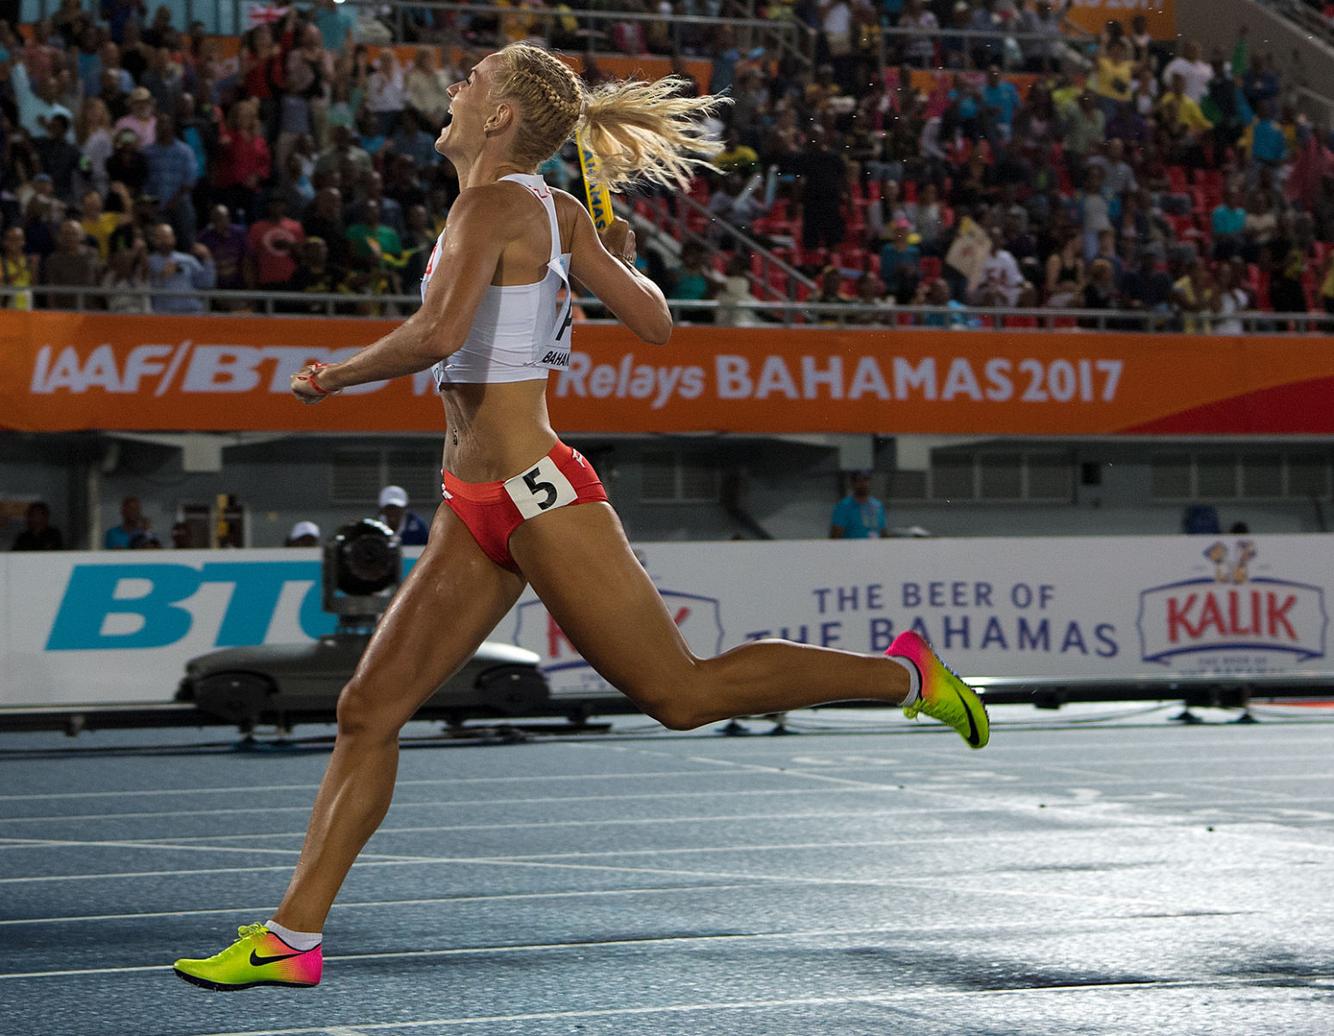 1r2017_bahamas_relays_day_2__sweity_poland_4x400____jeff_cohen_photo__799.jpg